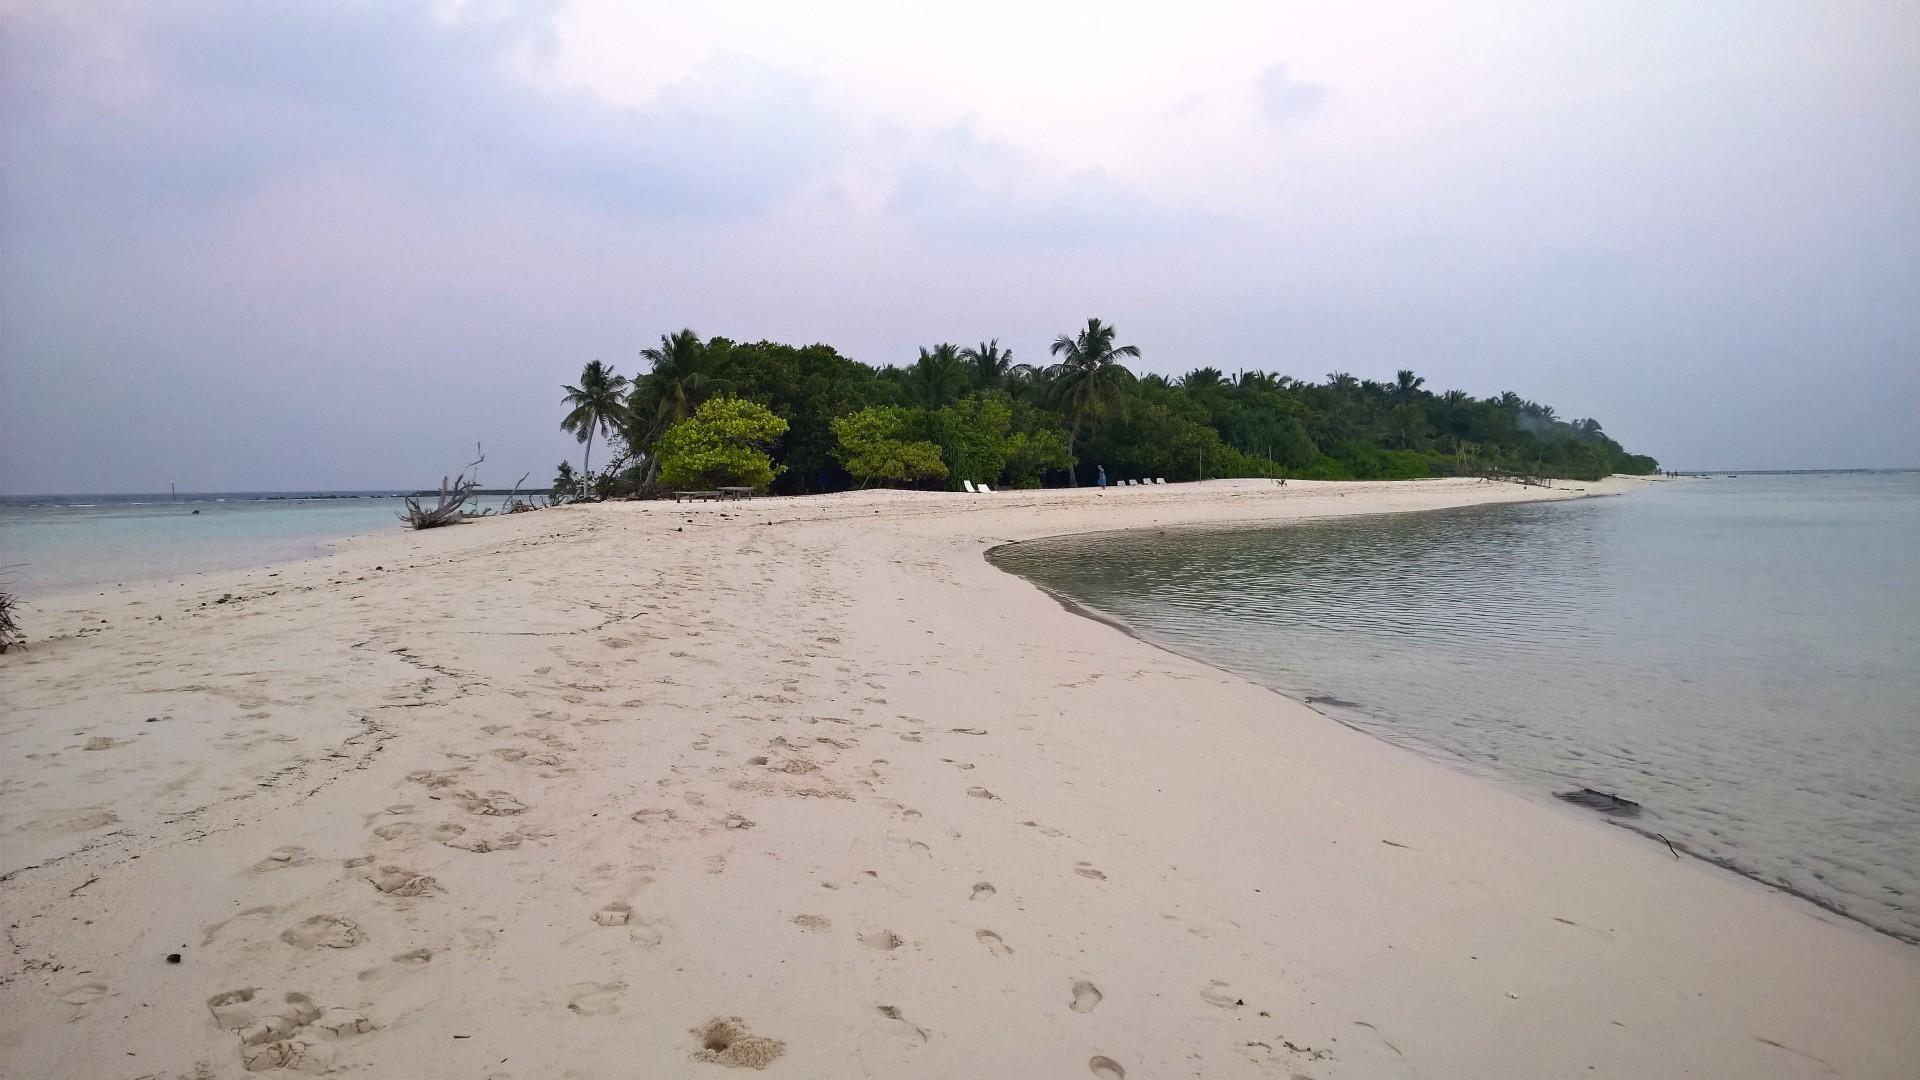 Malediven - Resorts oder bewohnte Inseln